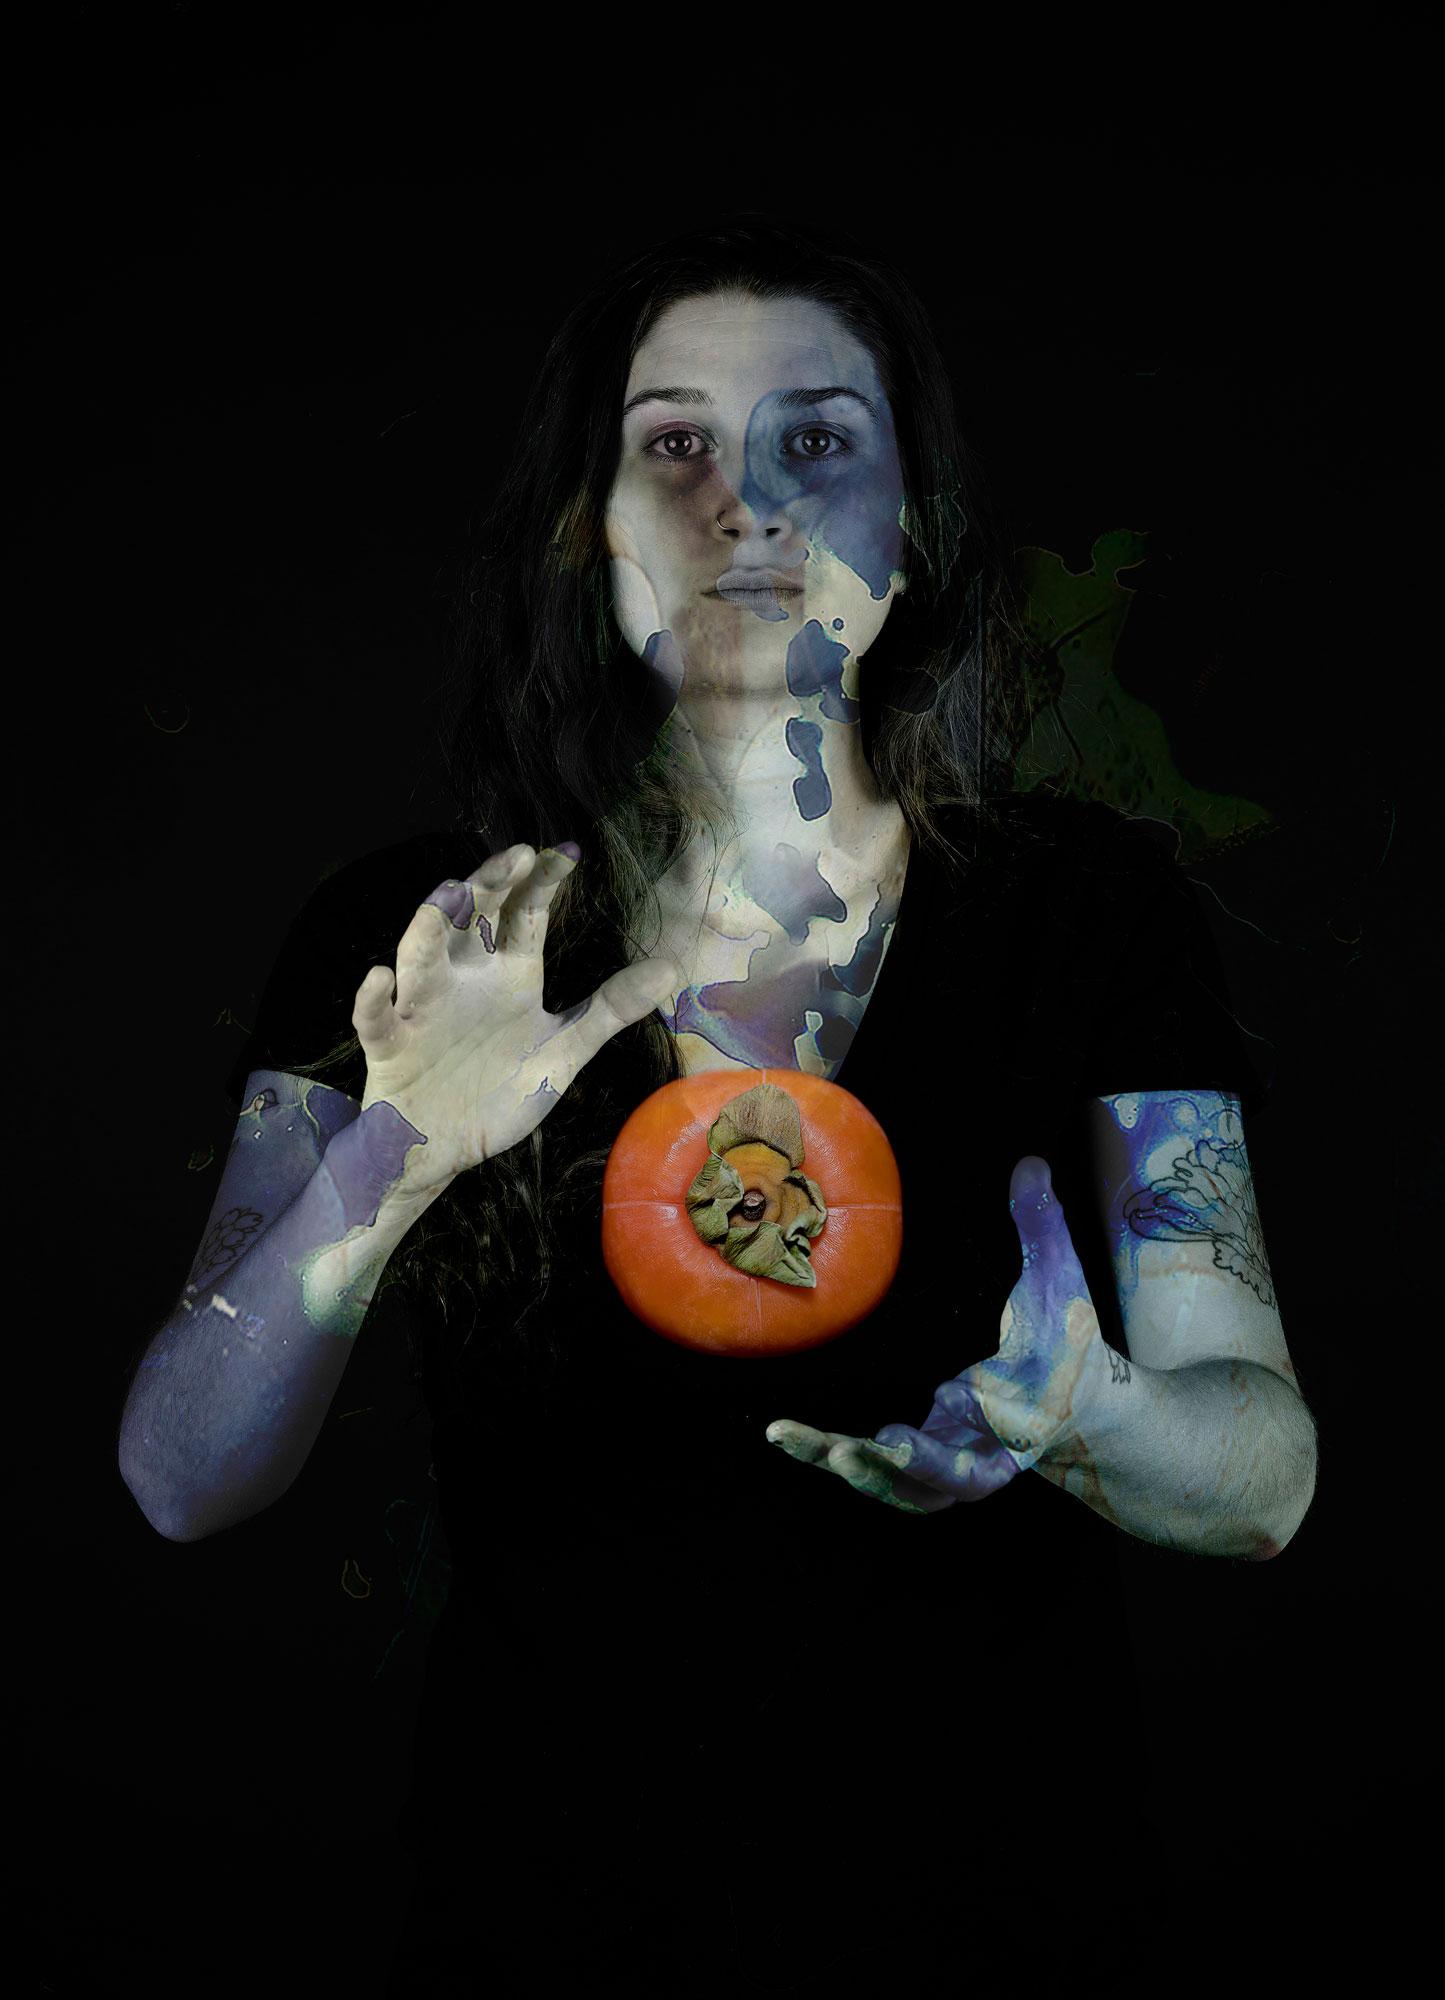 Leda-Chemical-Spirit-Portrait-series--8.jpg